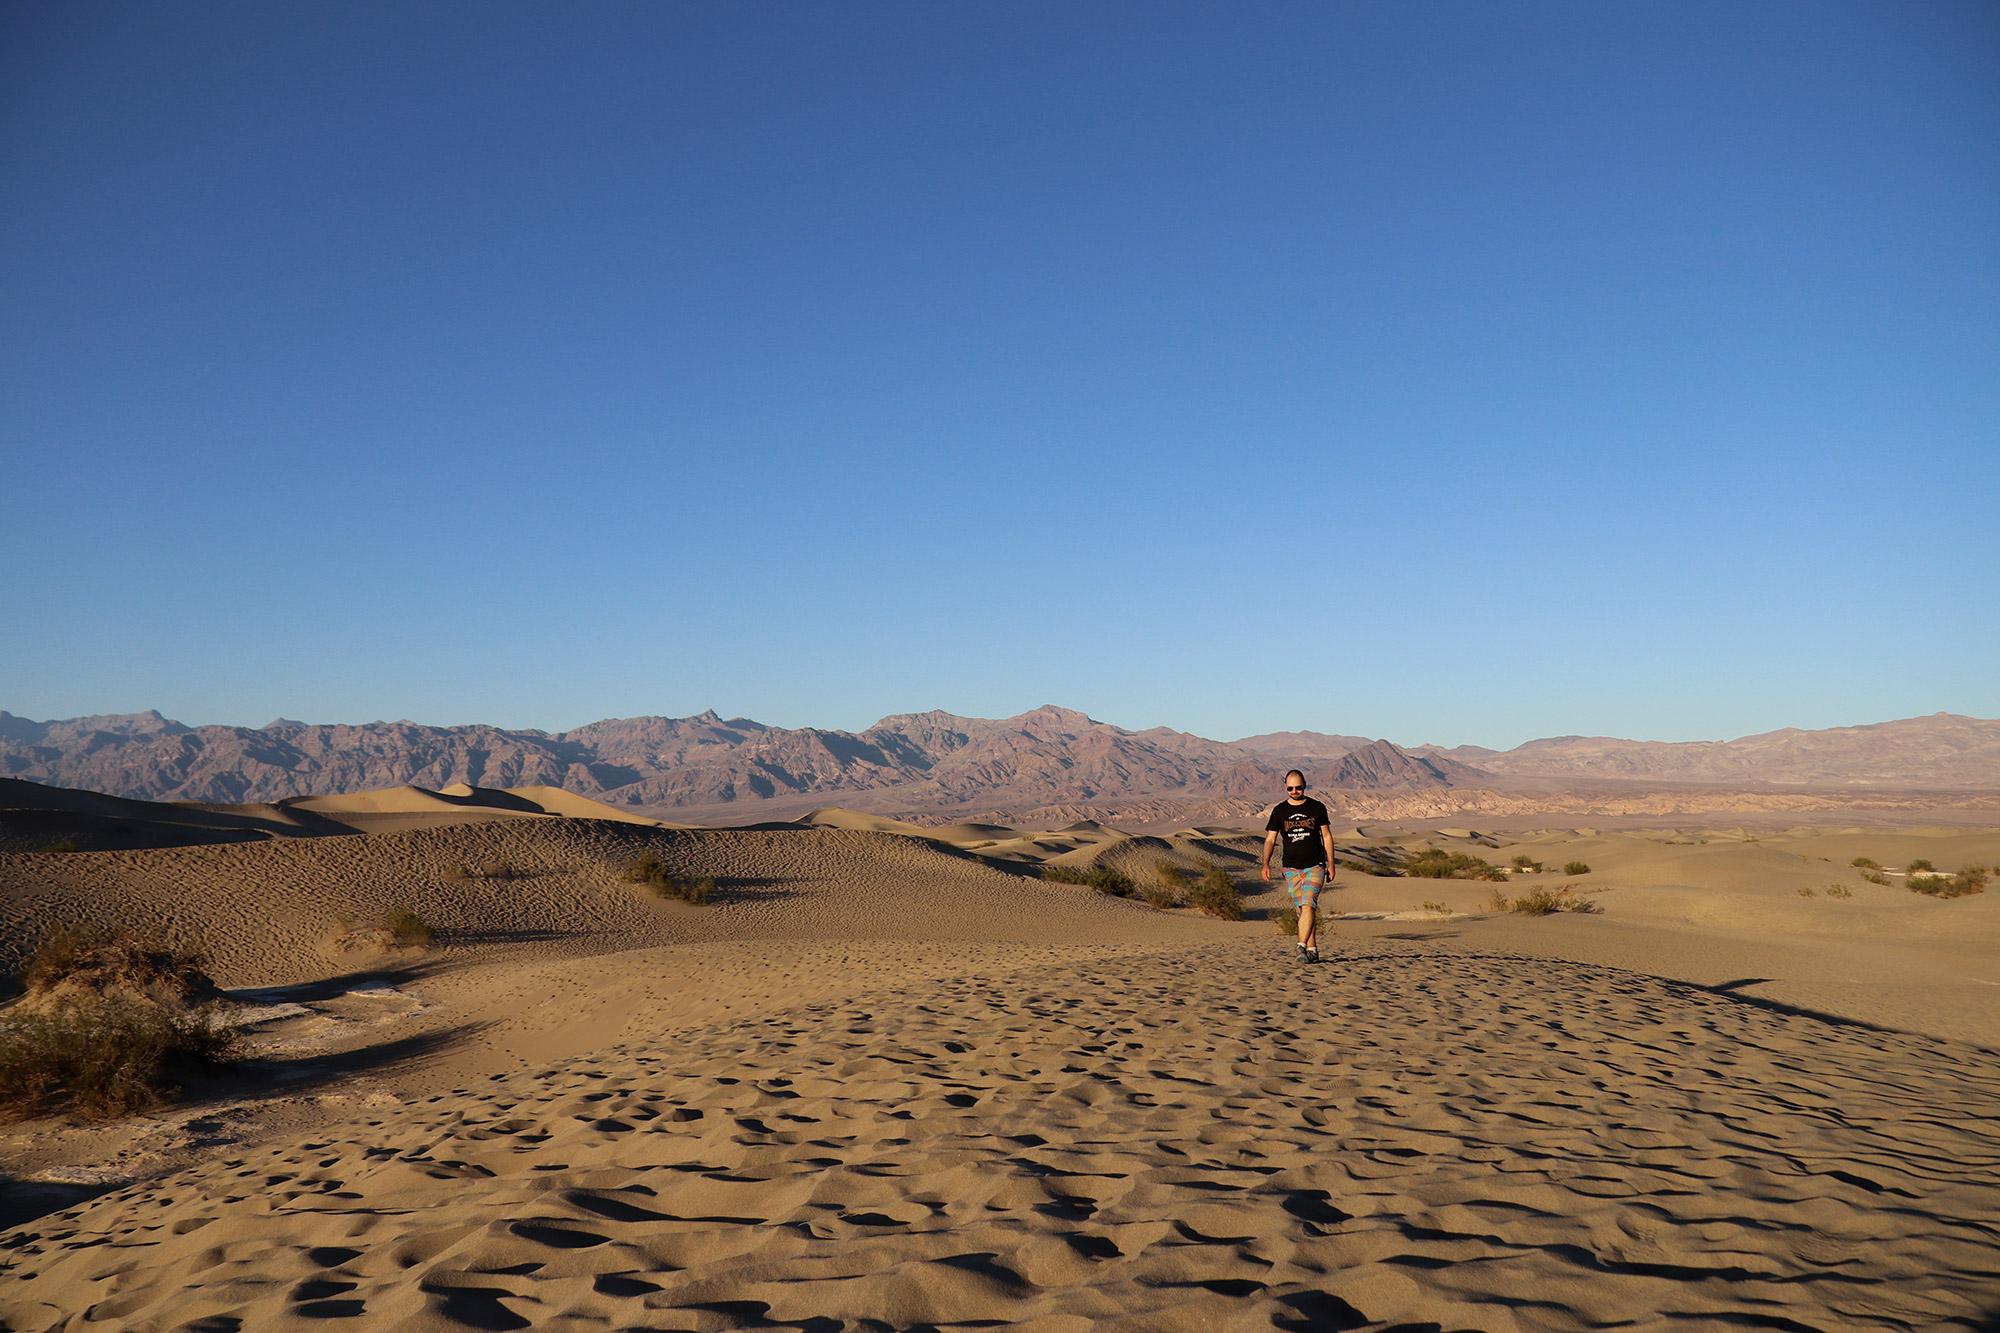 Amerika dag 18 - Death Valley National Park - Mesquite Flat Sand Dunes